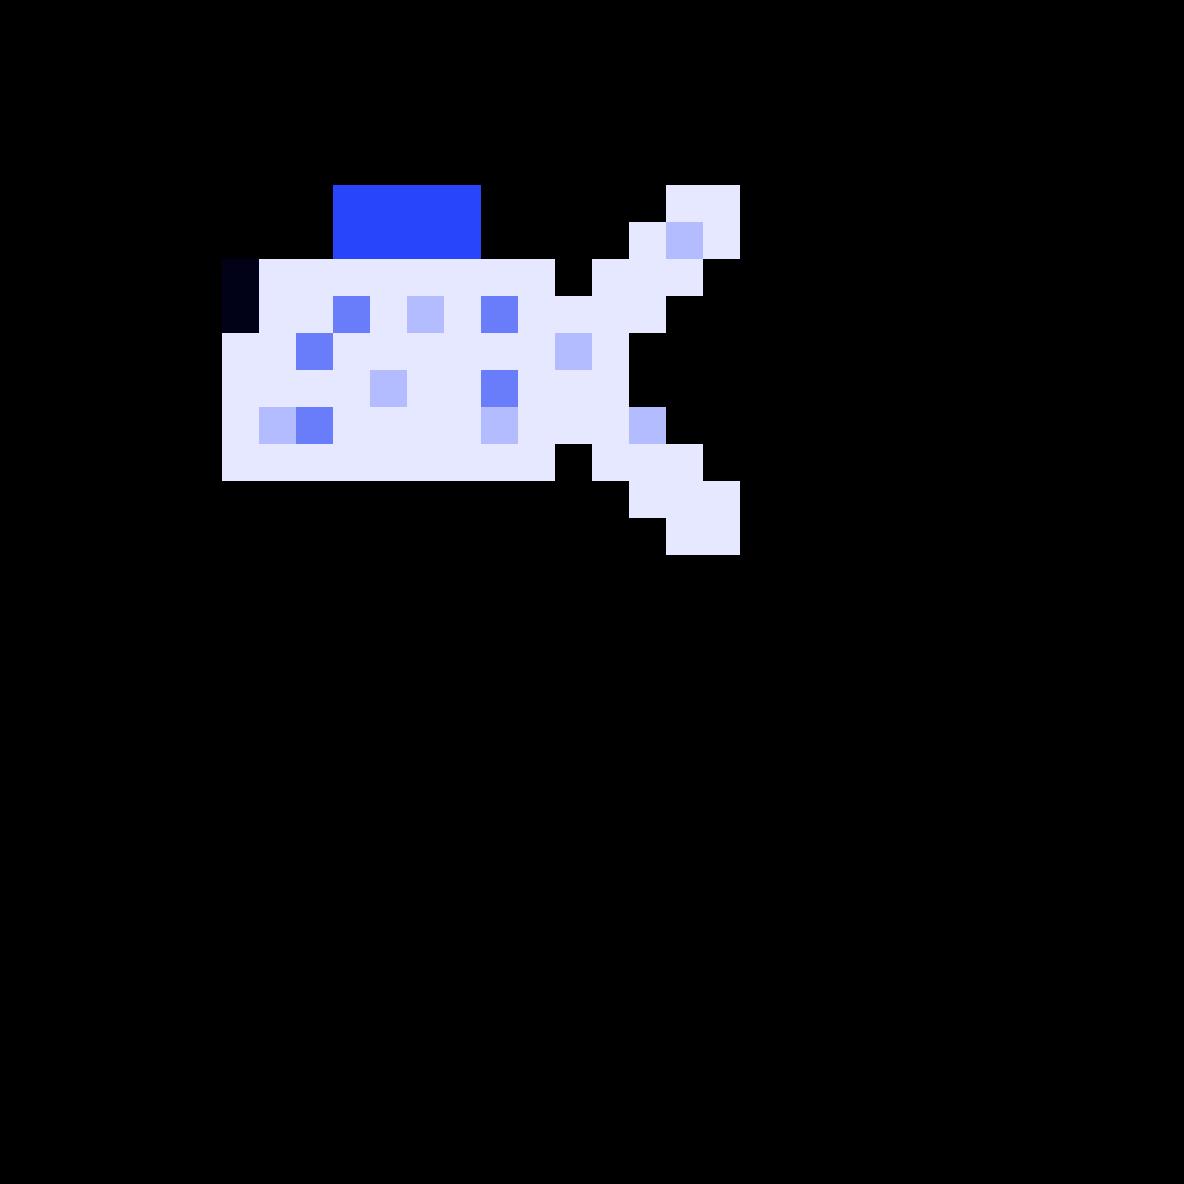 fish3 by Pixel-Lil